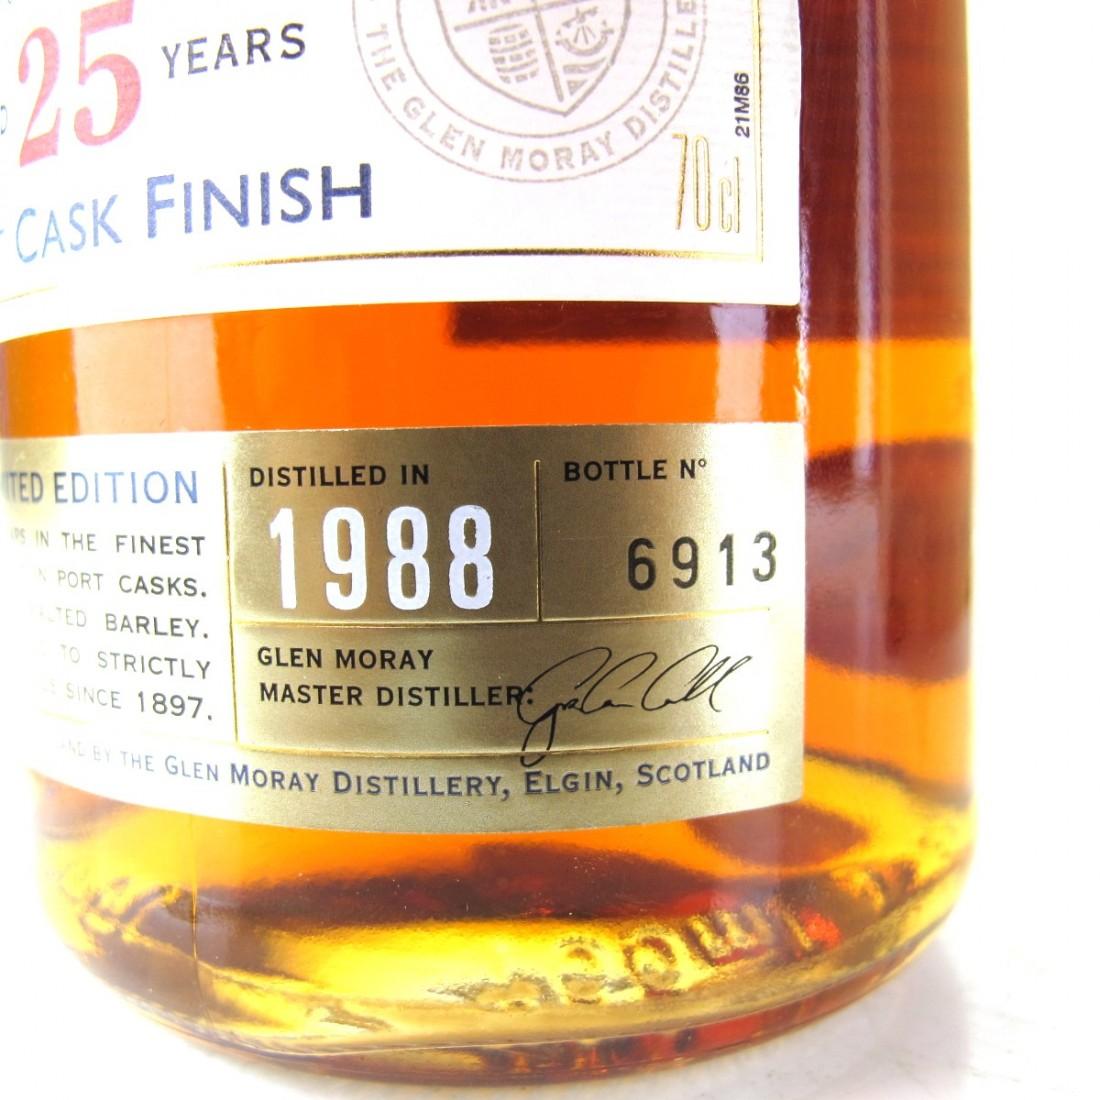 Glen Moray 1988 25 Year Old Port Cask Finish